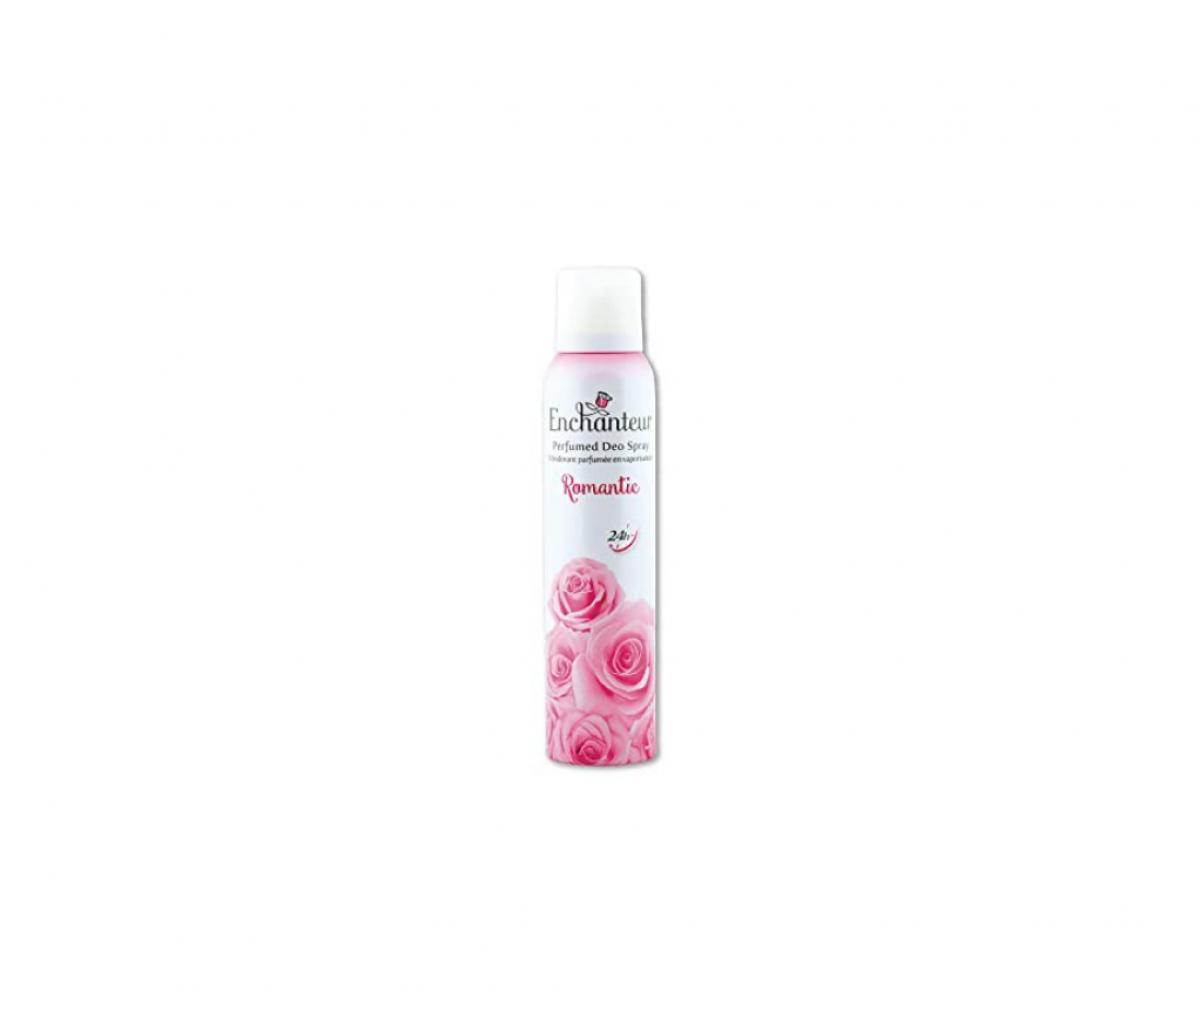 Enchanteur Deo Spray 150ml Romantic